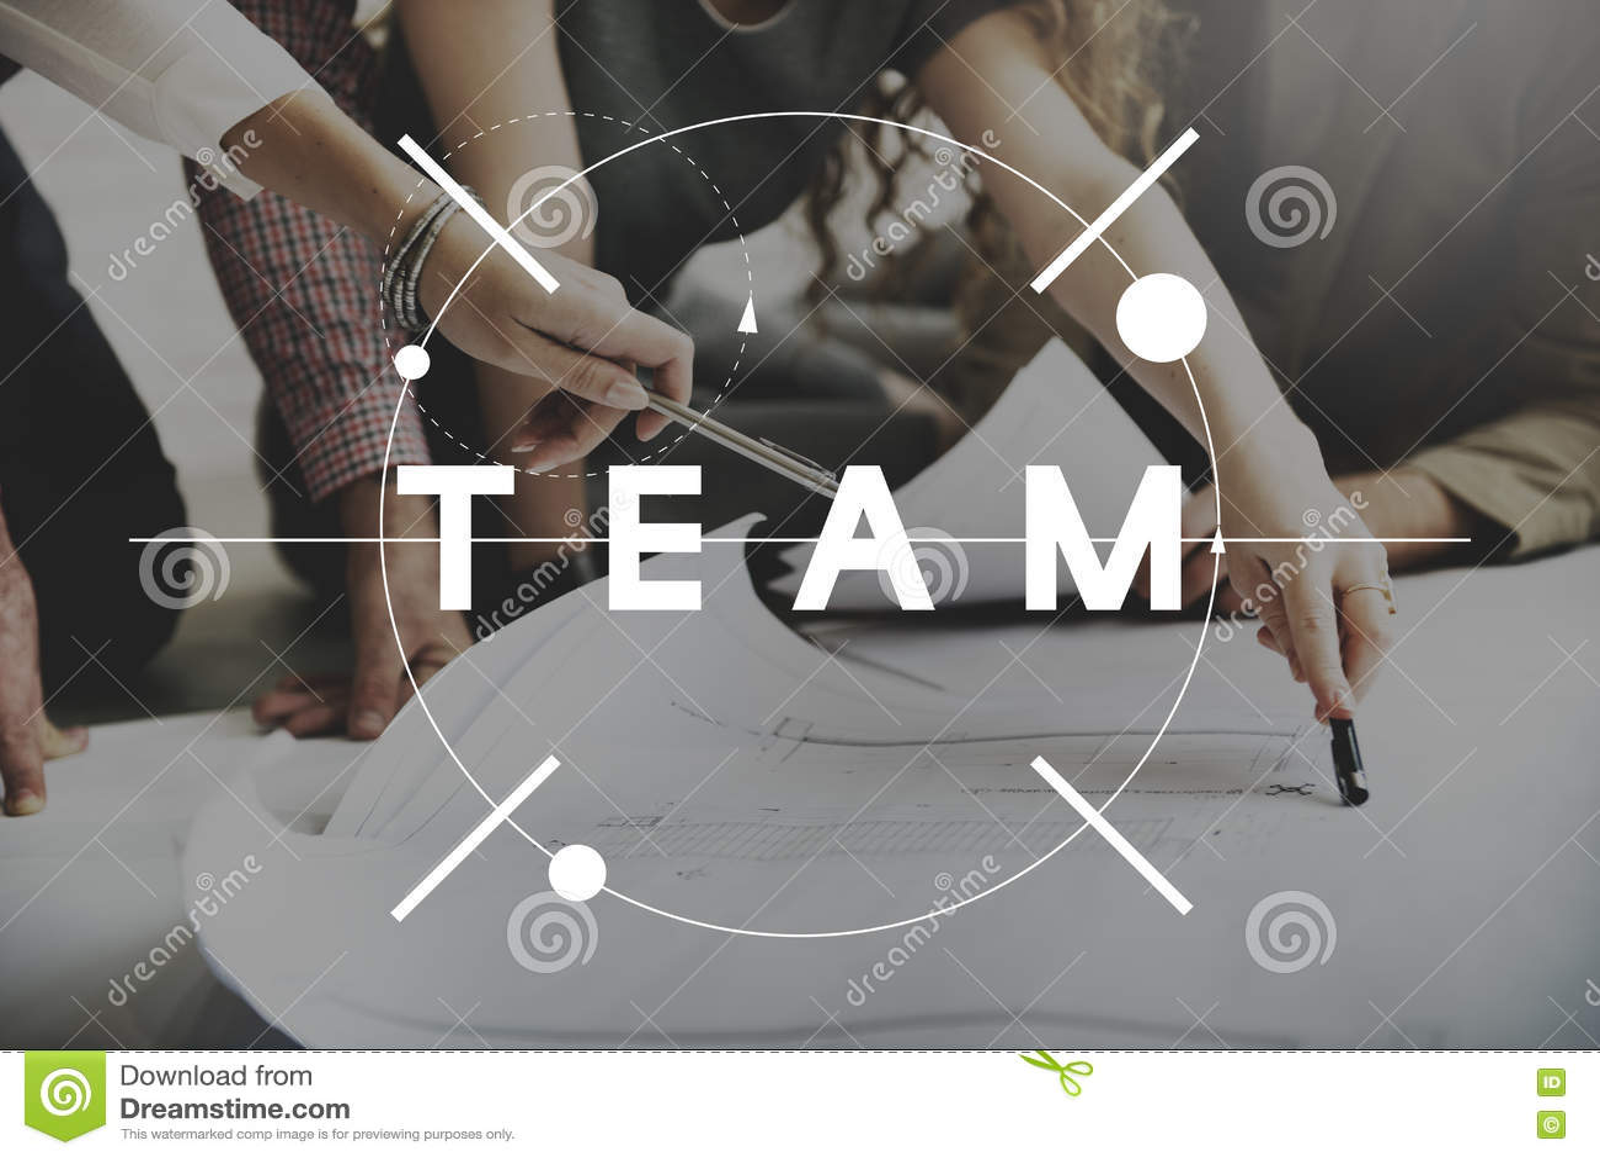 Team Teamwork Collaboration Cooperation Concept